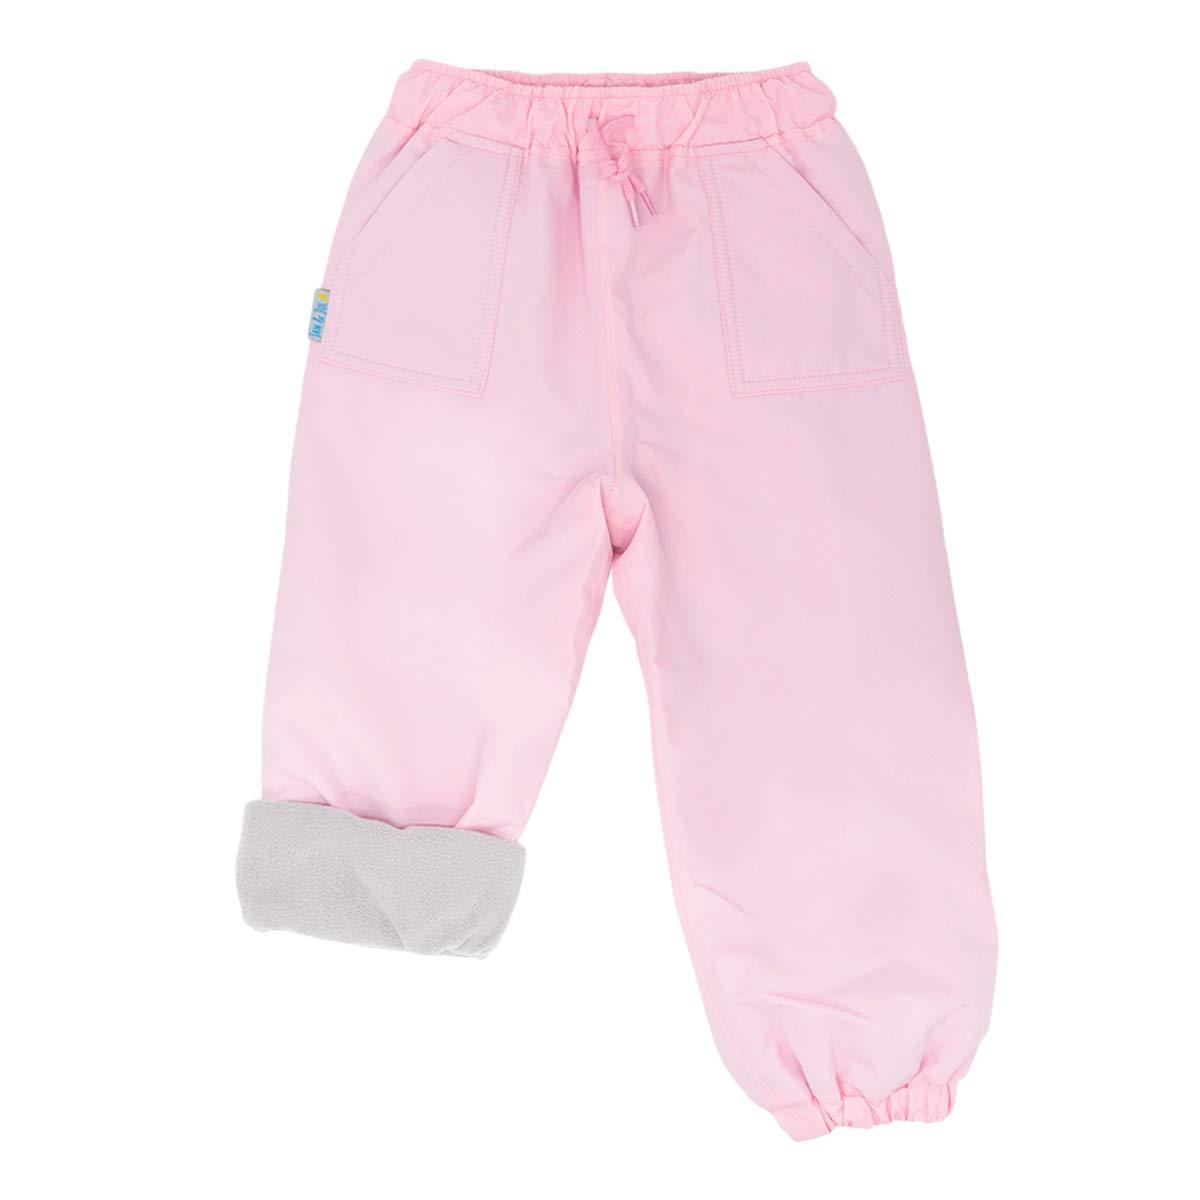 JAN & JUL Kids Waterproof Pants Girls, Cozy-Dry Soil-Repellent (Fleece-Lined: Pink, 8T)